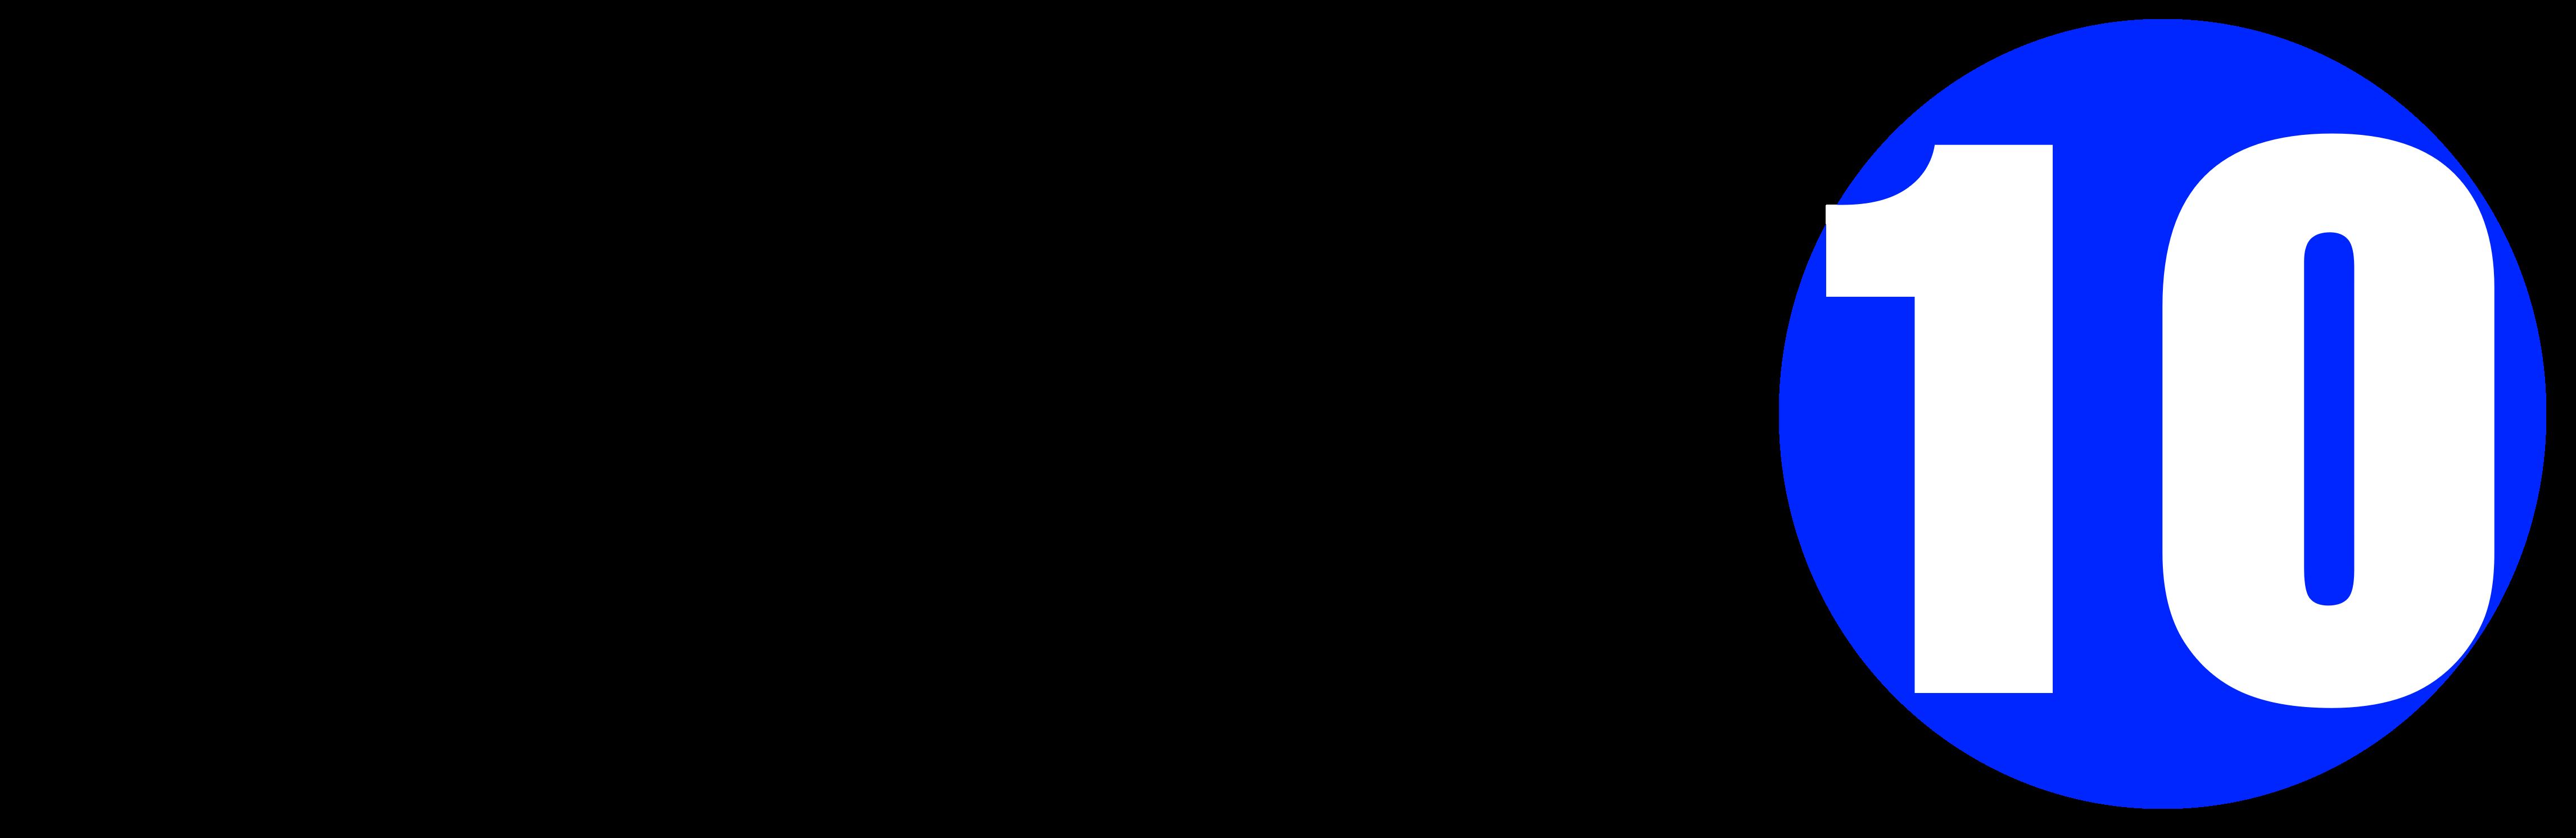 AlternateHistory.com's KLFY logo #1.png